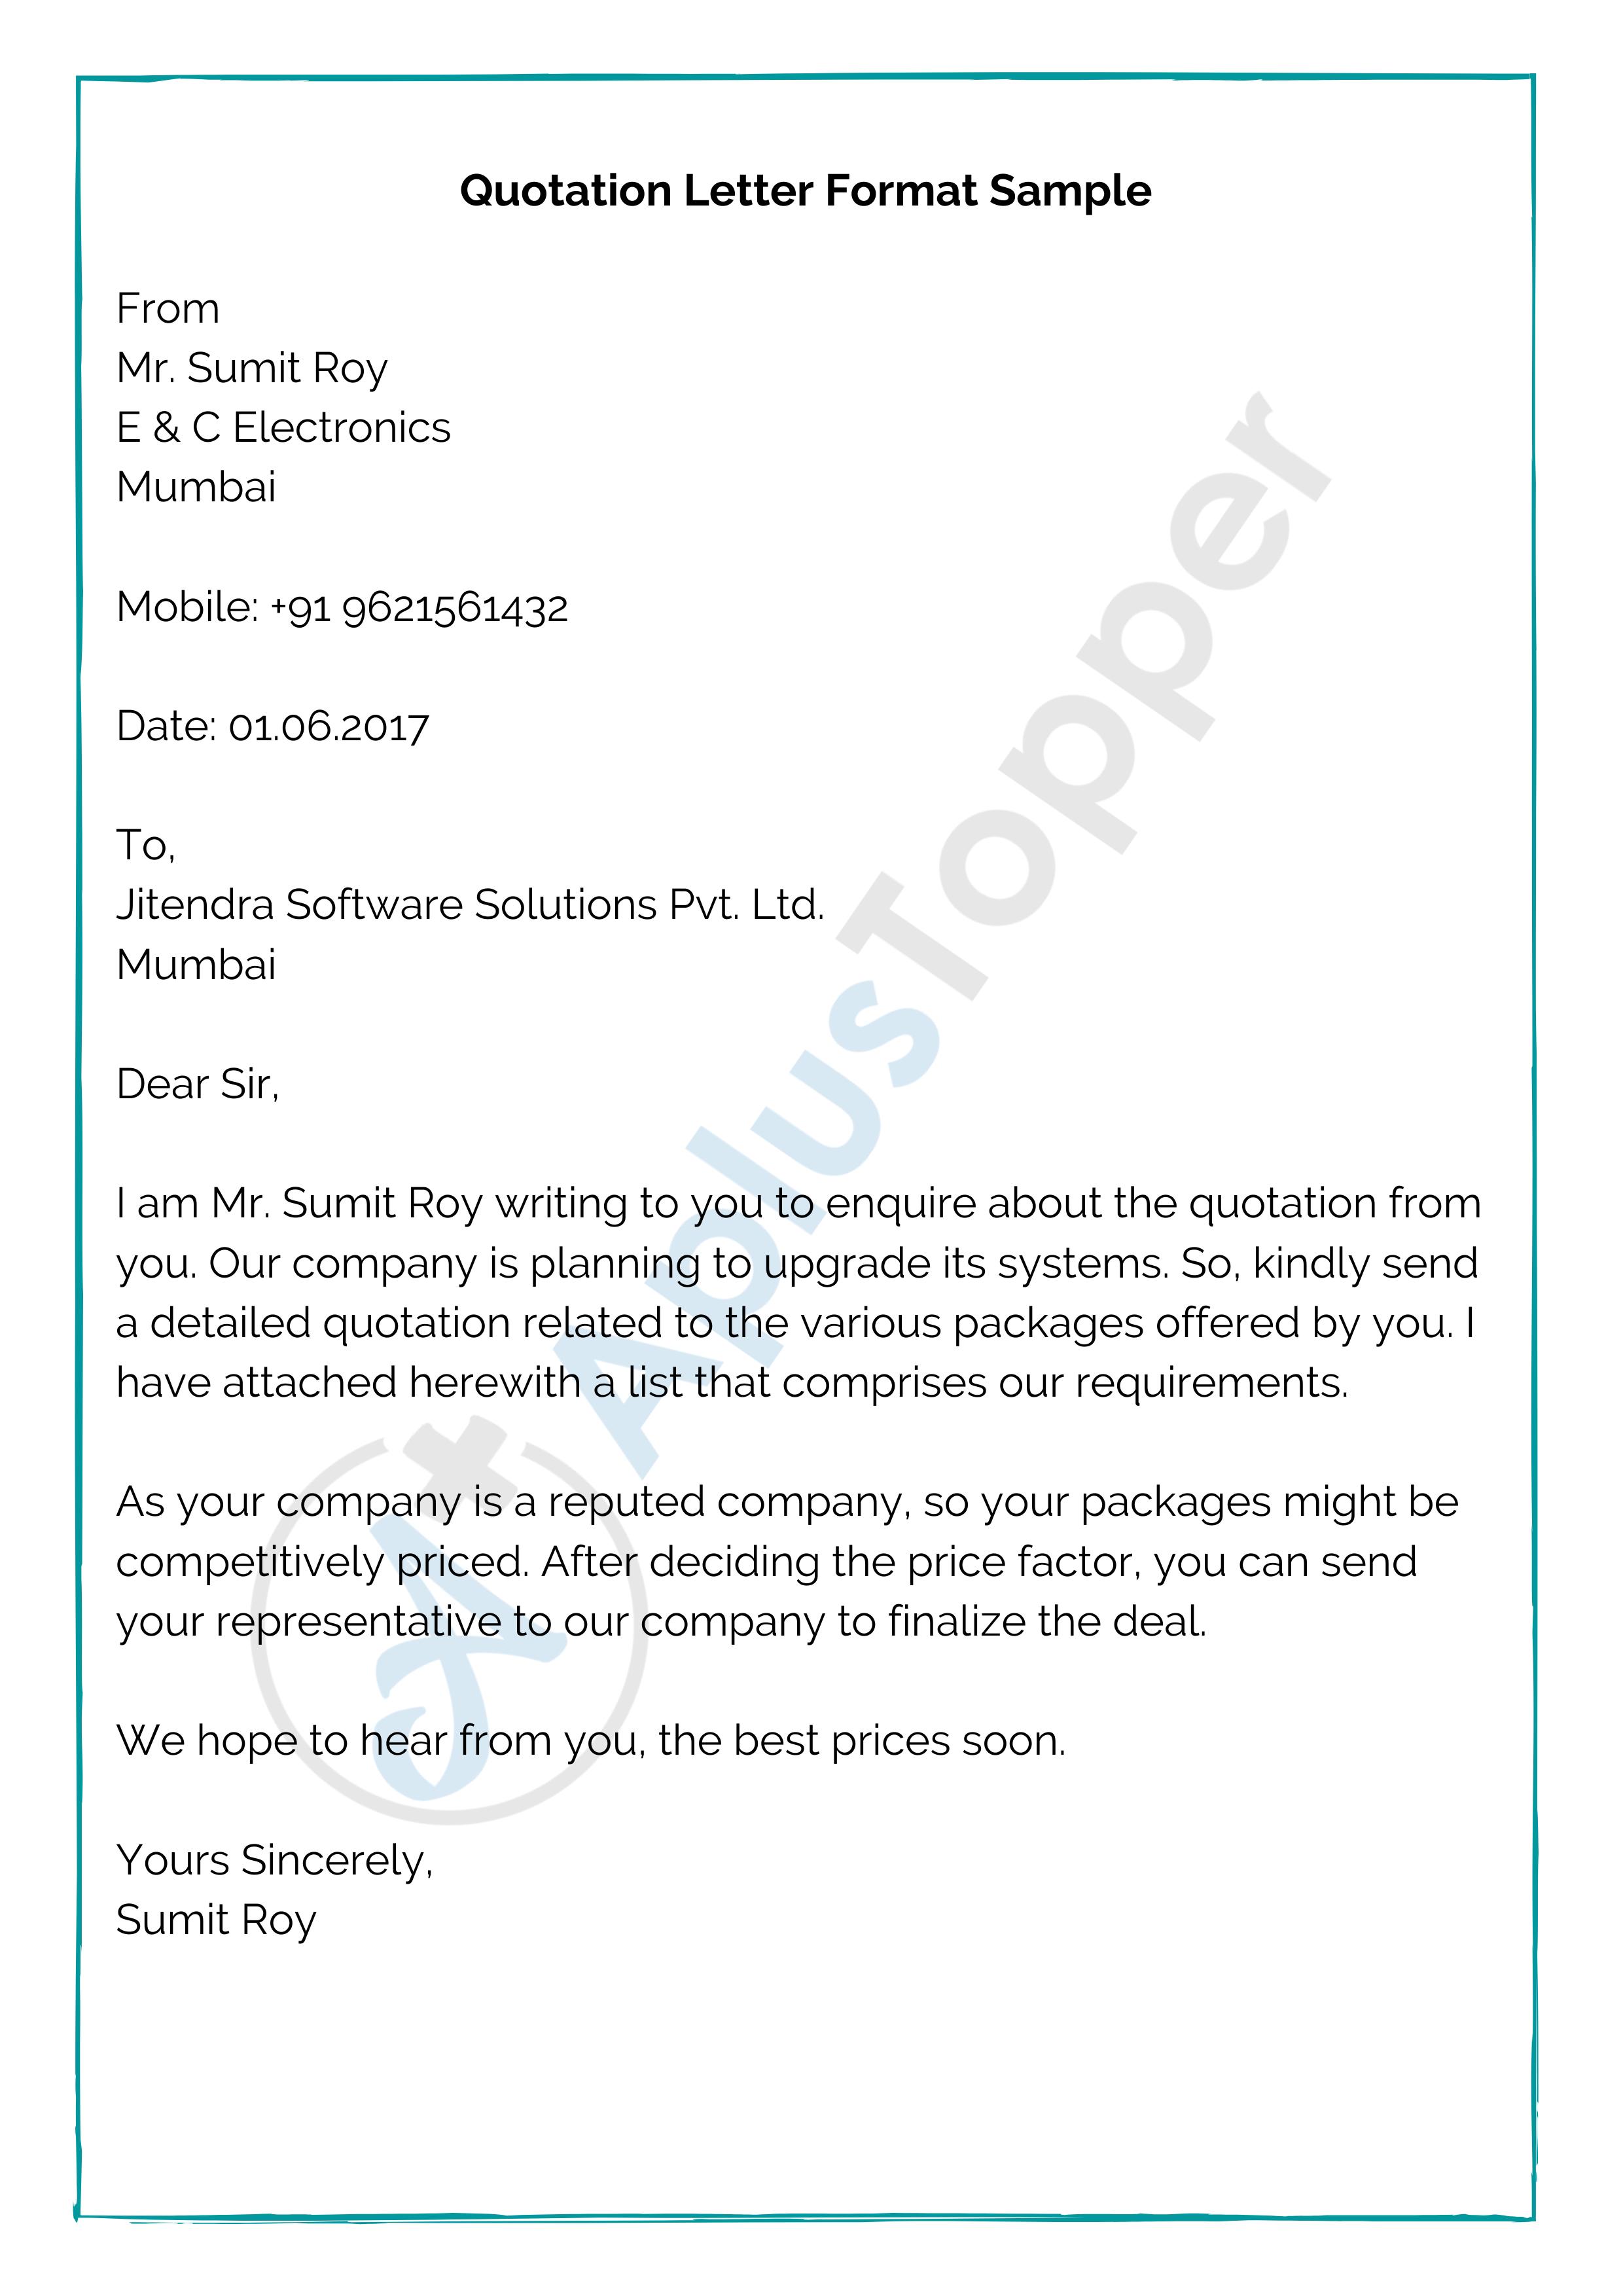 Quotation Format Letter Sample